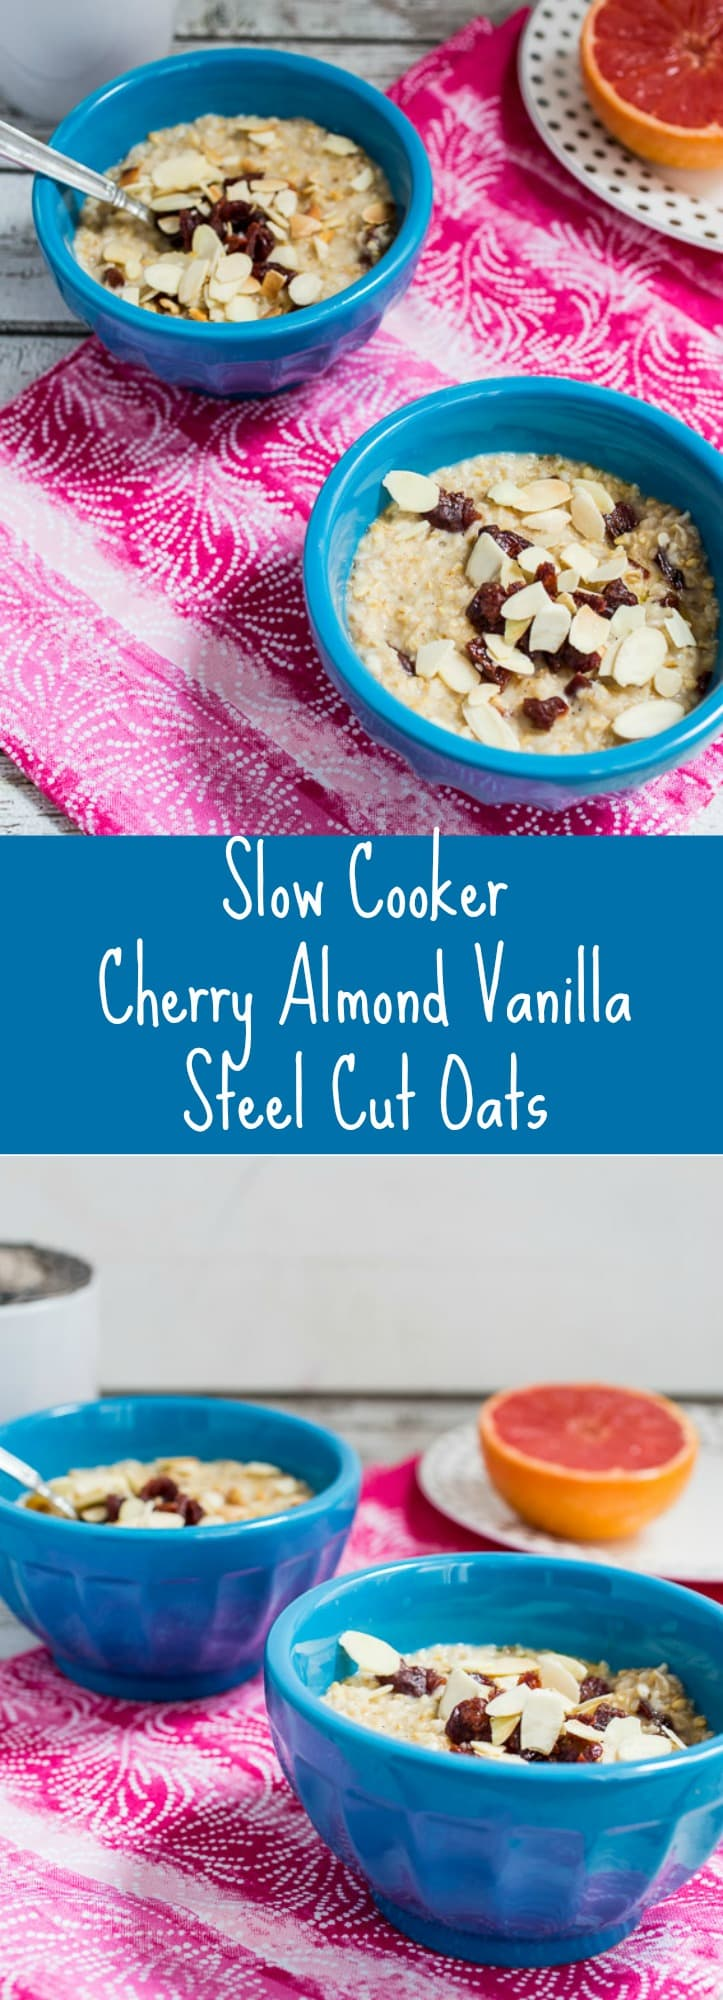 Slow Cooker Cherry Almond Vanilla Steel Cut Oats